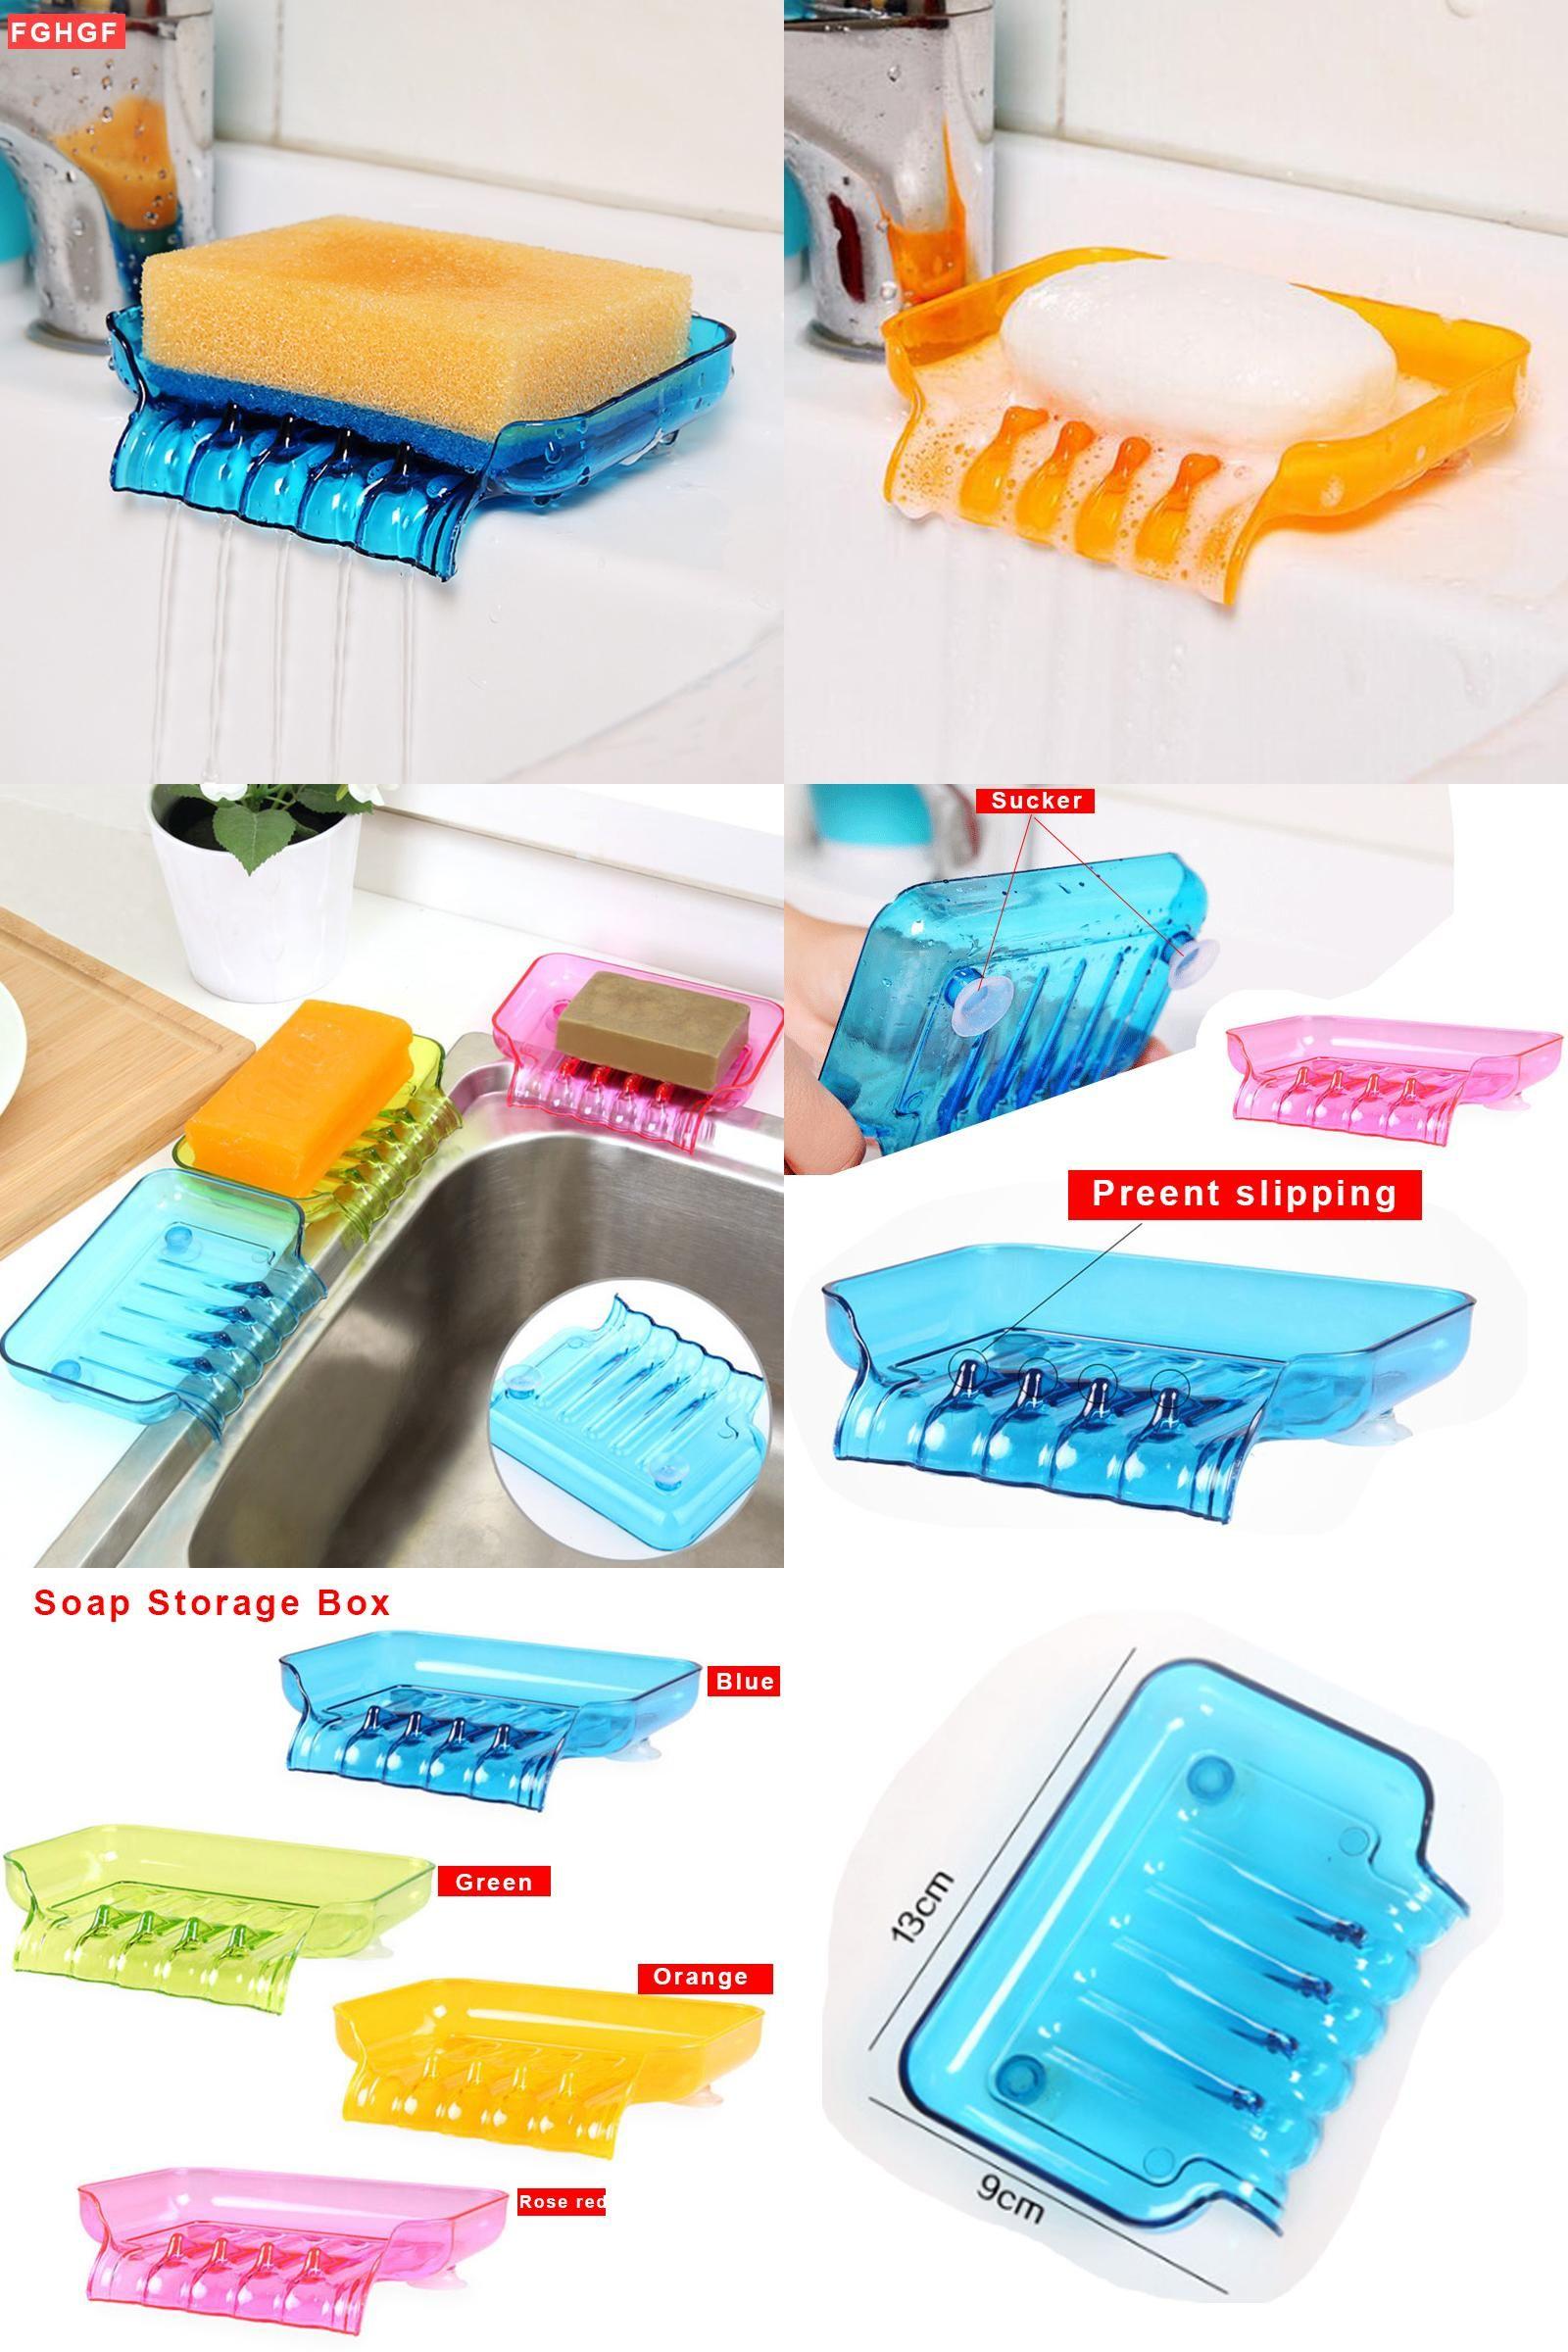 Visit to Buy] New Soap Storage Box Dish Case Makeup Organizer Water ...